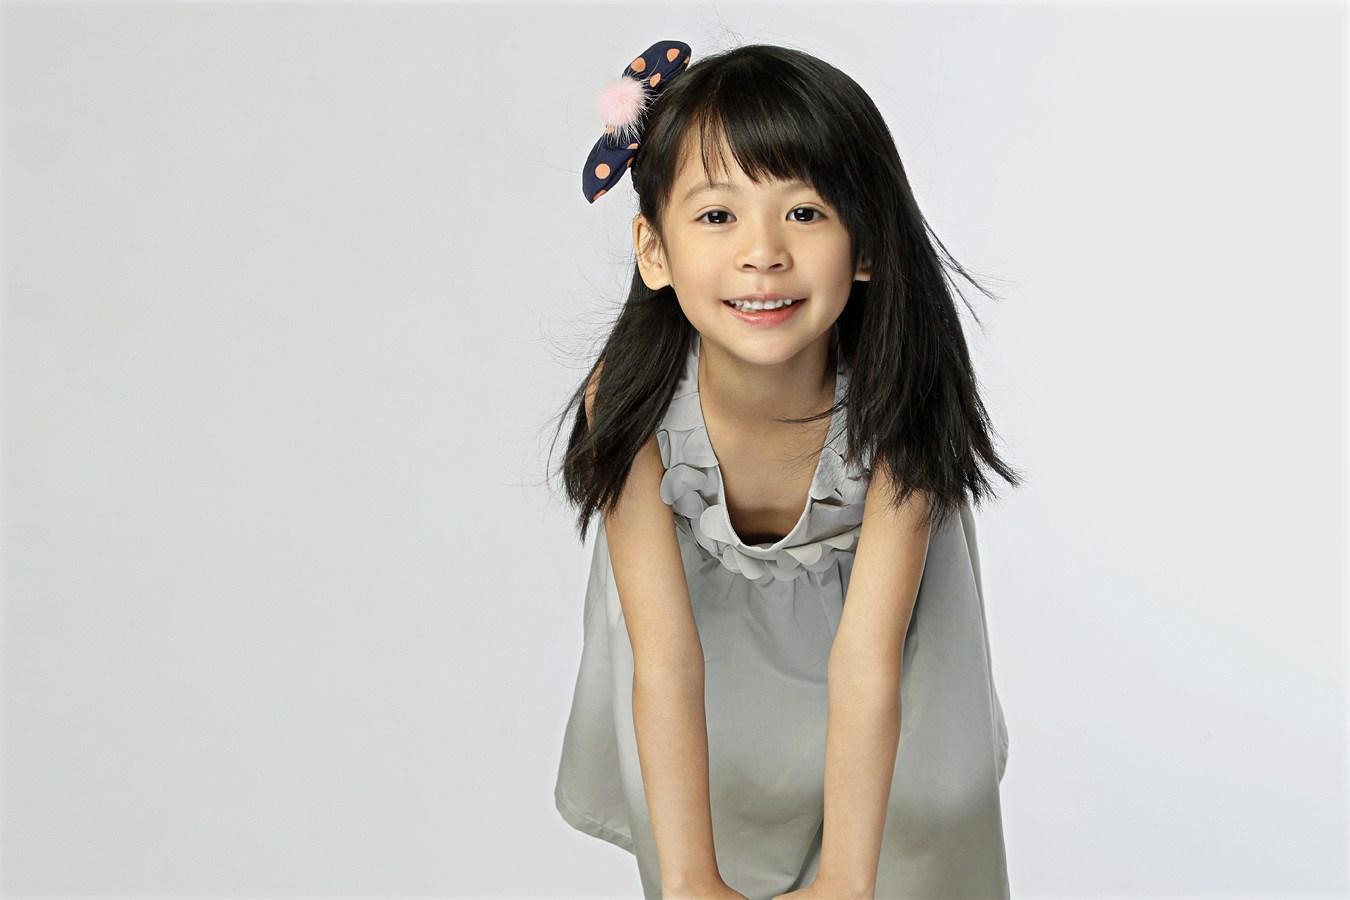 http://ent.qingdaonews.com/images/attachement/jpg/site1/20131014/e89a8f2aabce13c56f6002.jpg /enpproperty-->  近日,翁虹在自己的博客晒出了女儿小水晶最新一组可爱照片,同时送上了对女儿六岁生日的祝福。博文中,翁虹字字句句表达了她对女儿的爱和期盼,并感叹时间真的很快,转眼六岁的女儿就要上学读书成为一个学生了。翁虹希望自己可以变成女儿的良师益友,而且她表示为了更好的陪伴女儿成长,要不断给自己充电,来应付